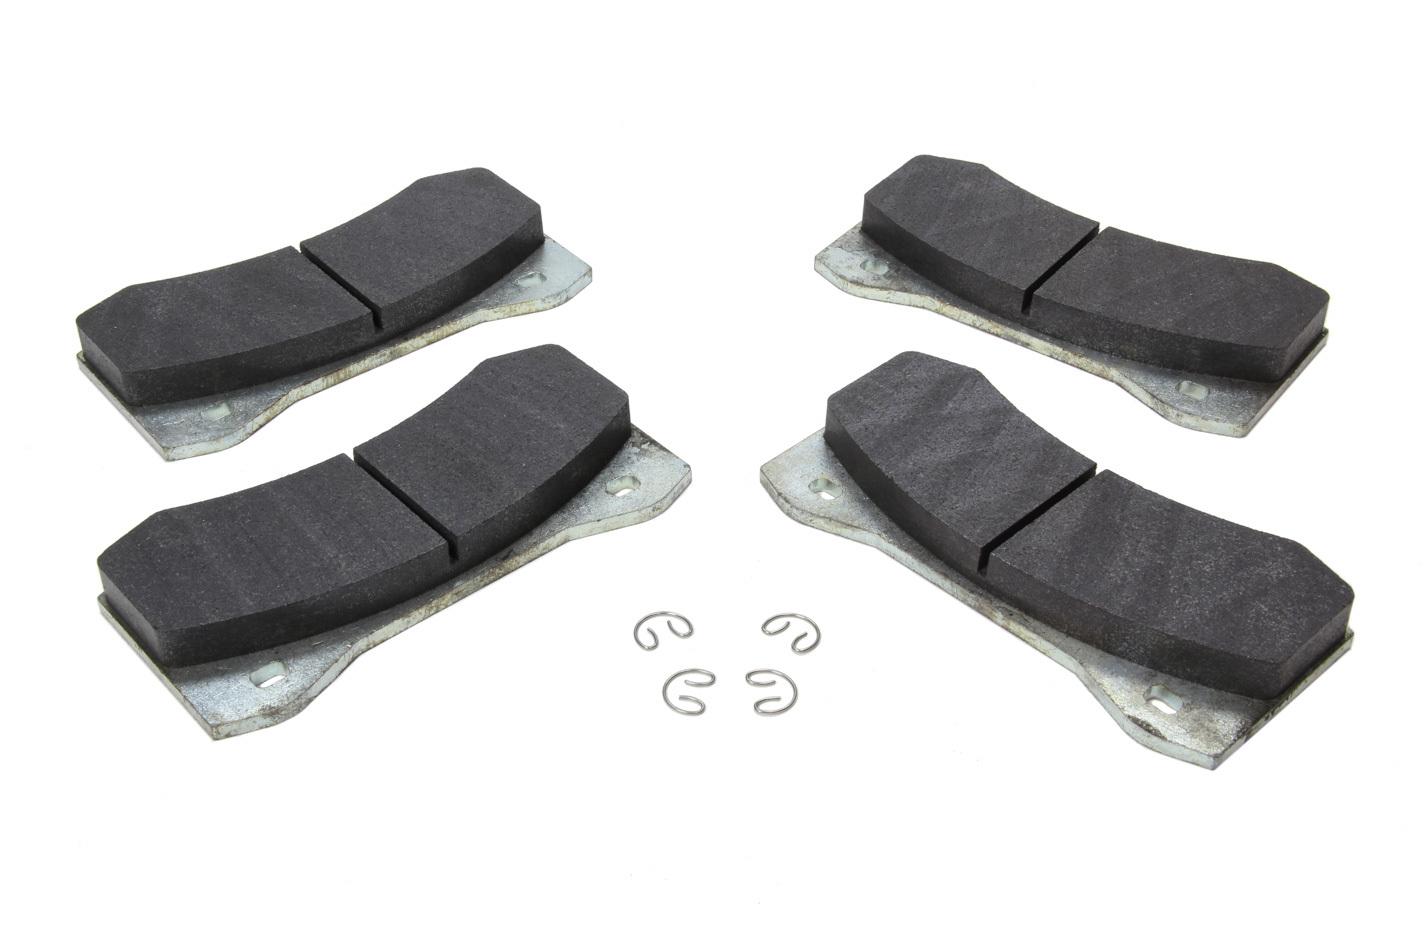 Wilwood 15E-12604K Brake Pads, PolyMatrix E Compound, Medium Friction, Medium Temperature, Aero 4 / 6 Caliper, Kit